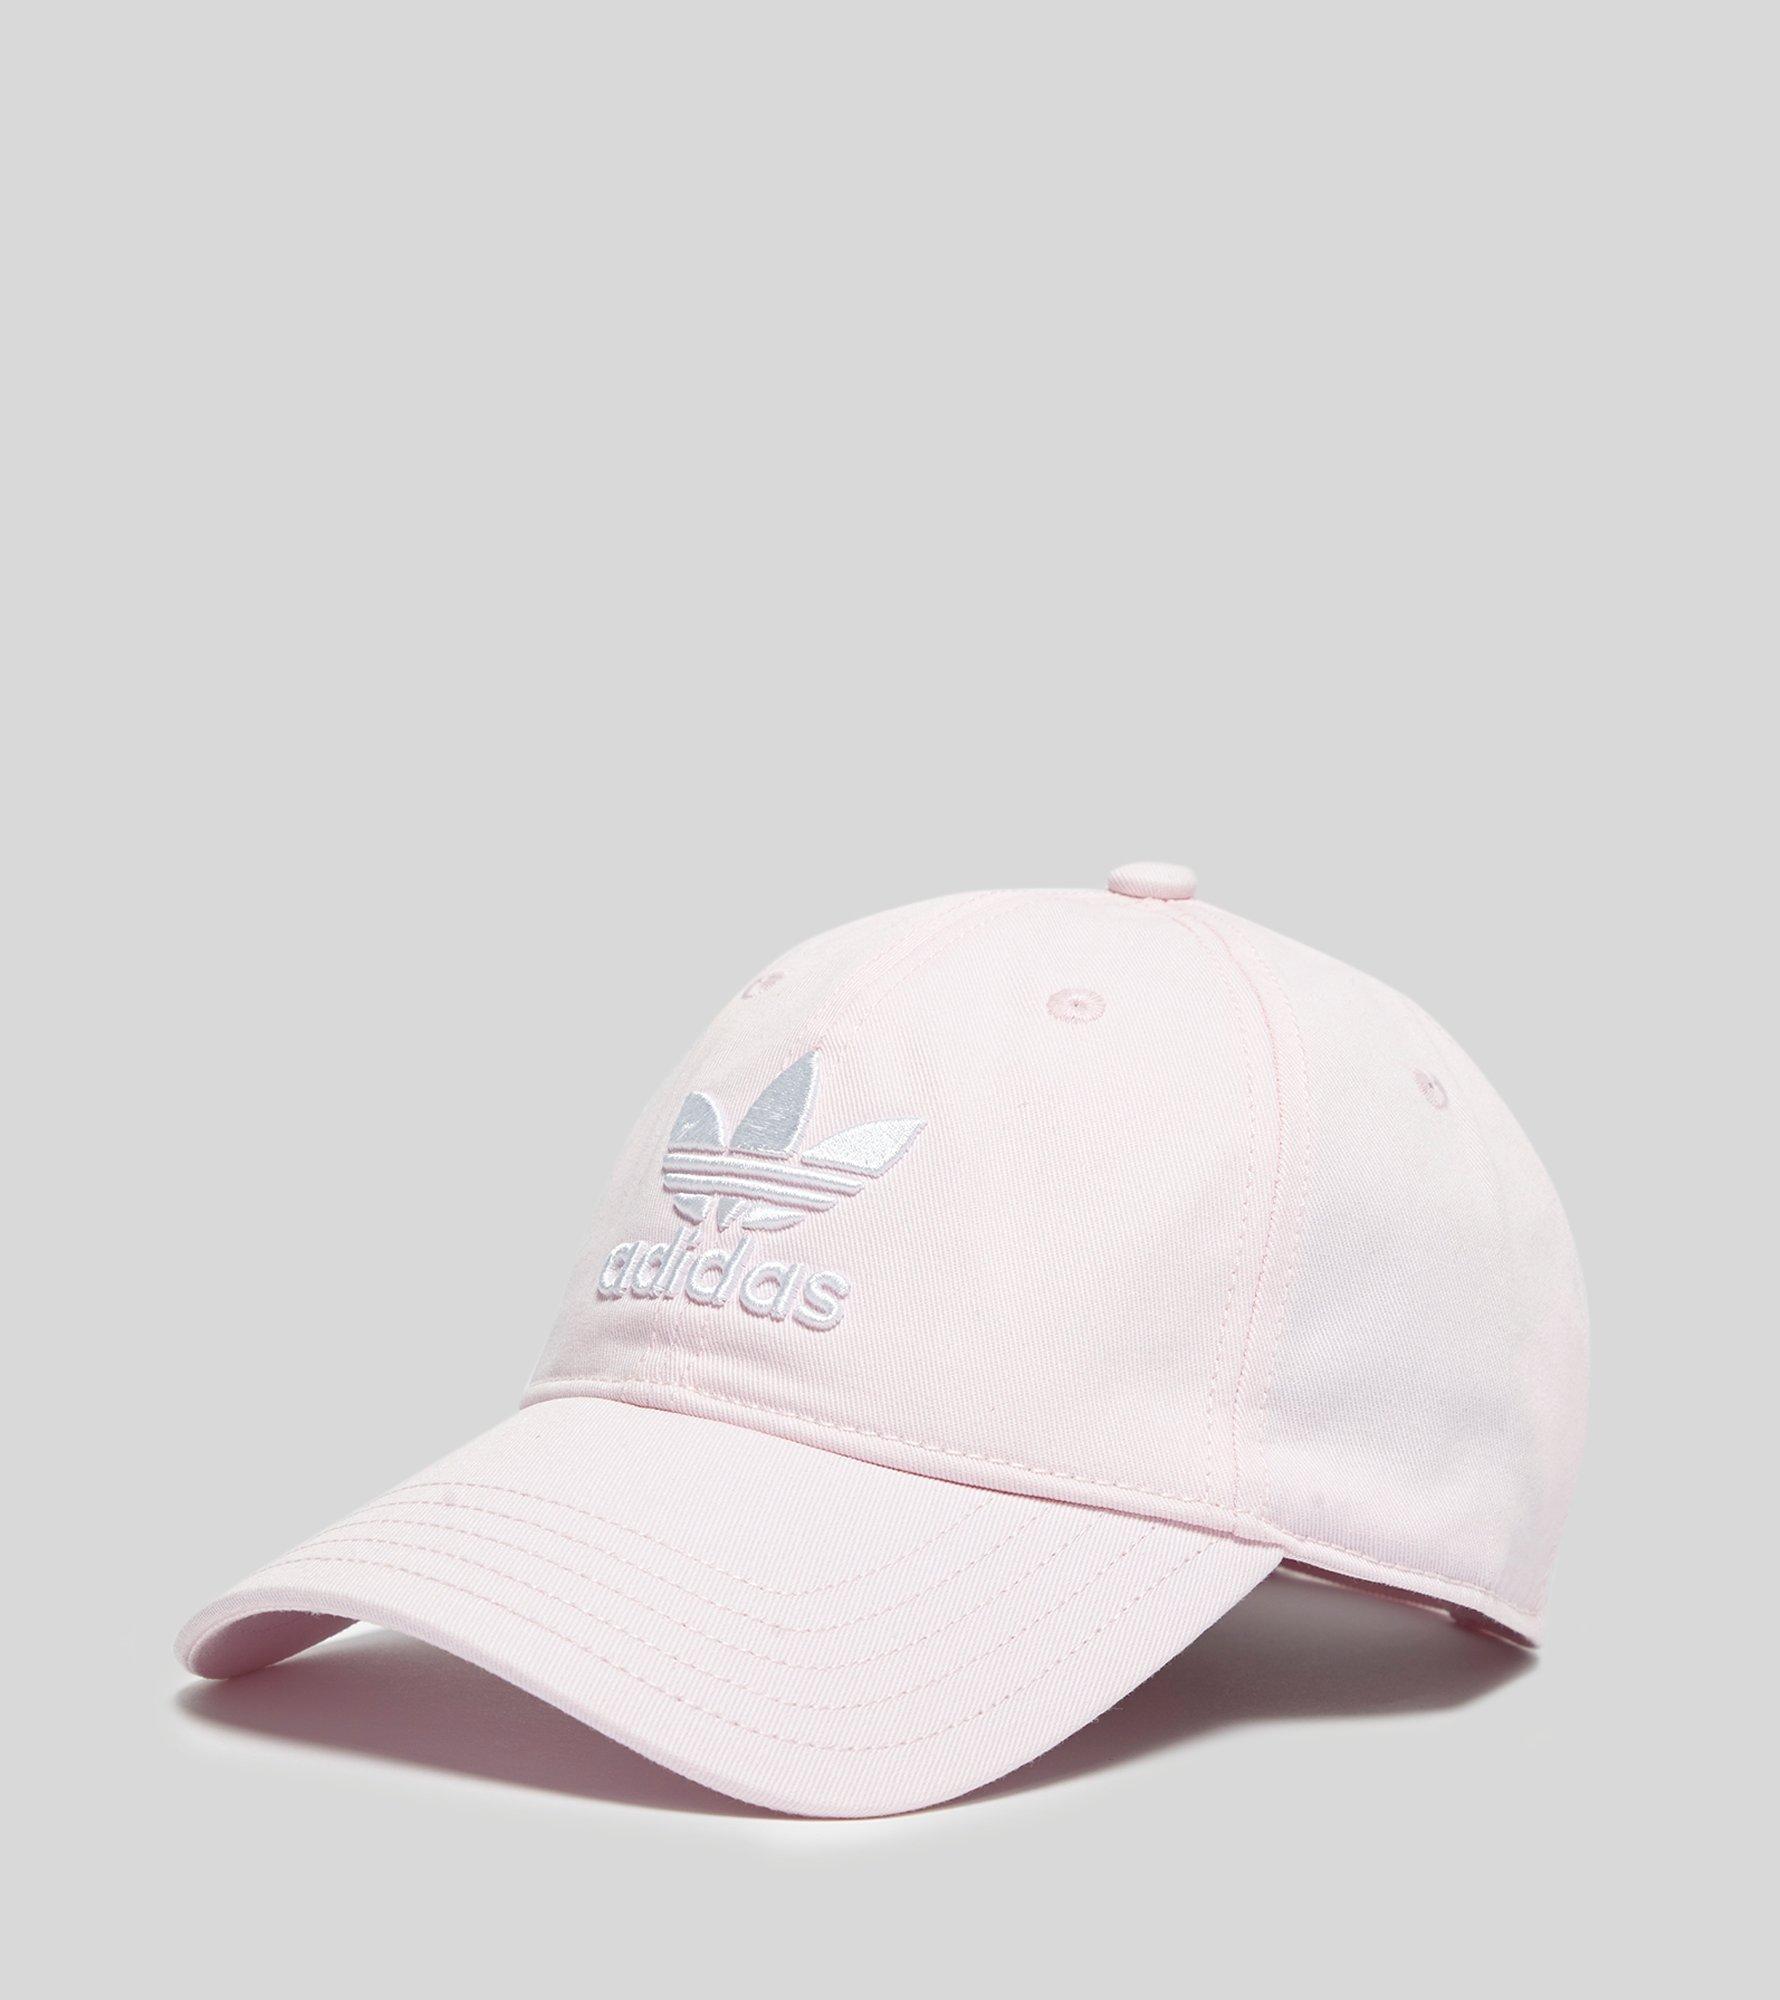 Lyst - adidas Originals Trefoil Cap in Pink af584ec80911